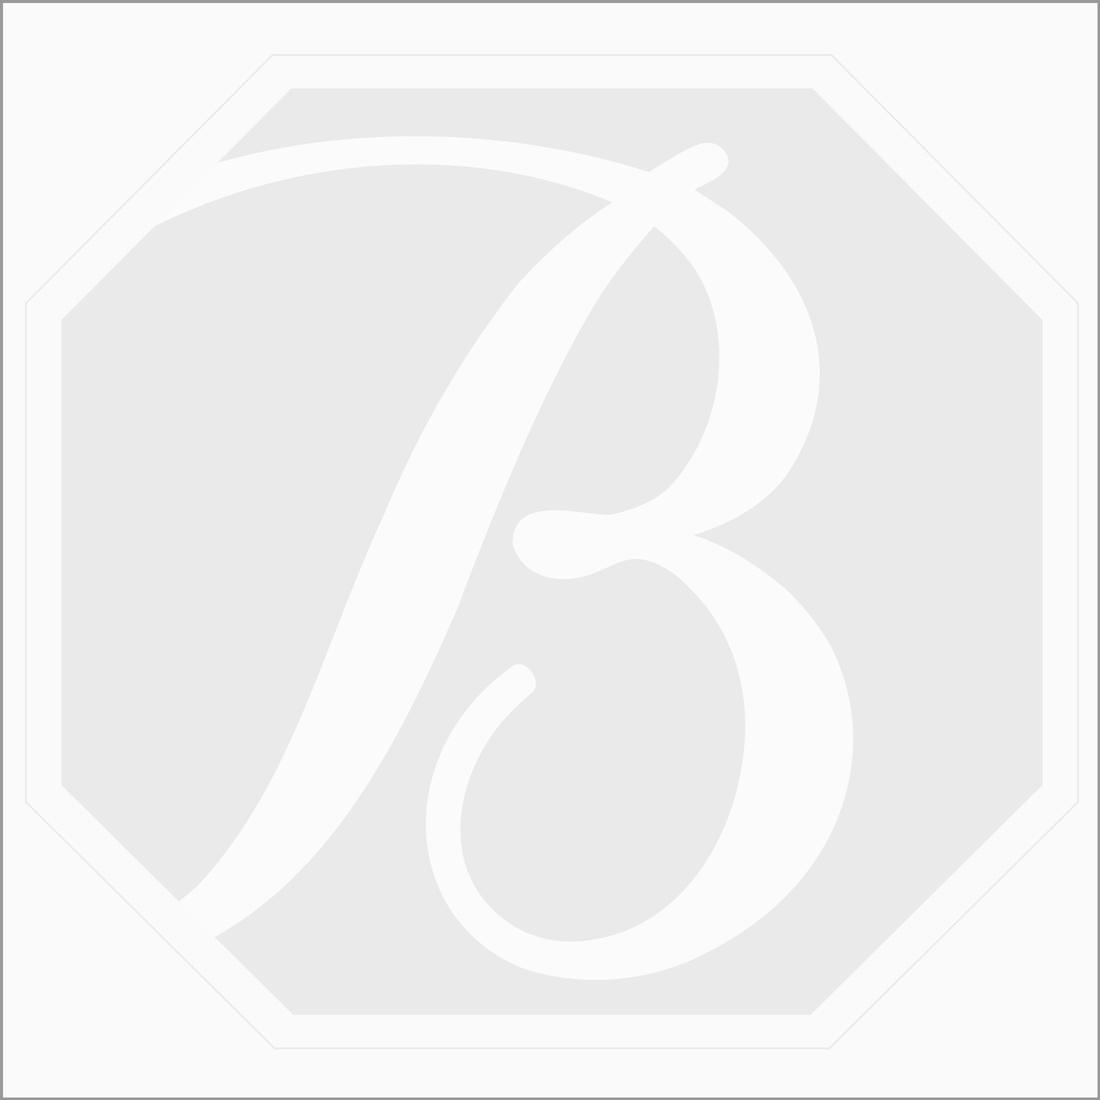 12 x 11 mm - Dark Gray Rose Cut Diamond Cushion Shape - 6.72 carats (FncyDiaRC1008)